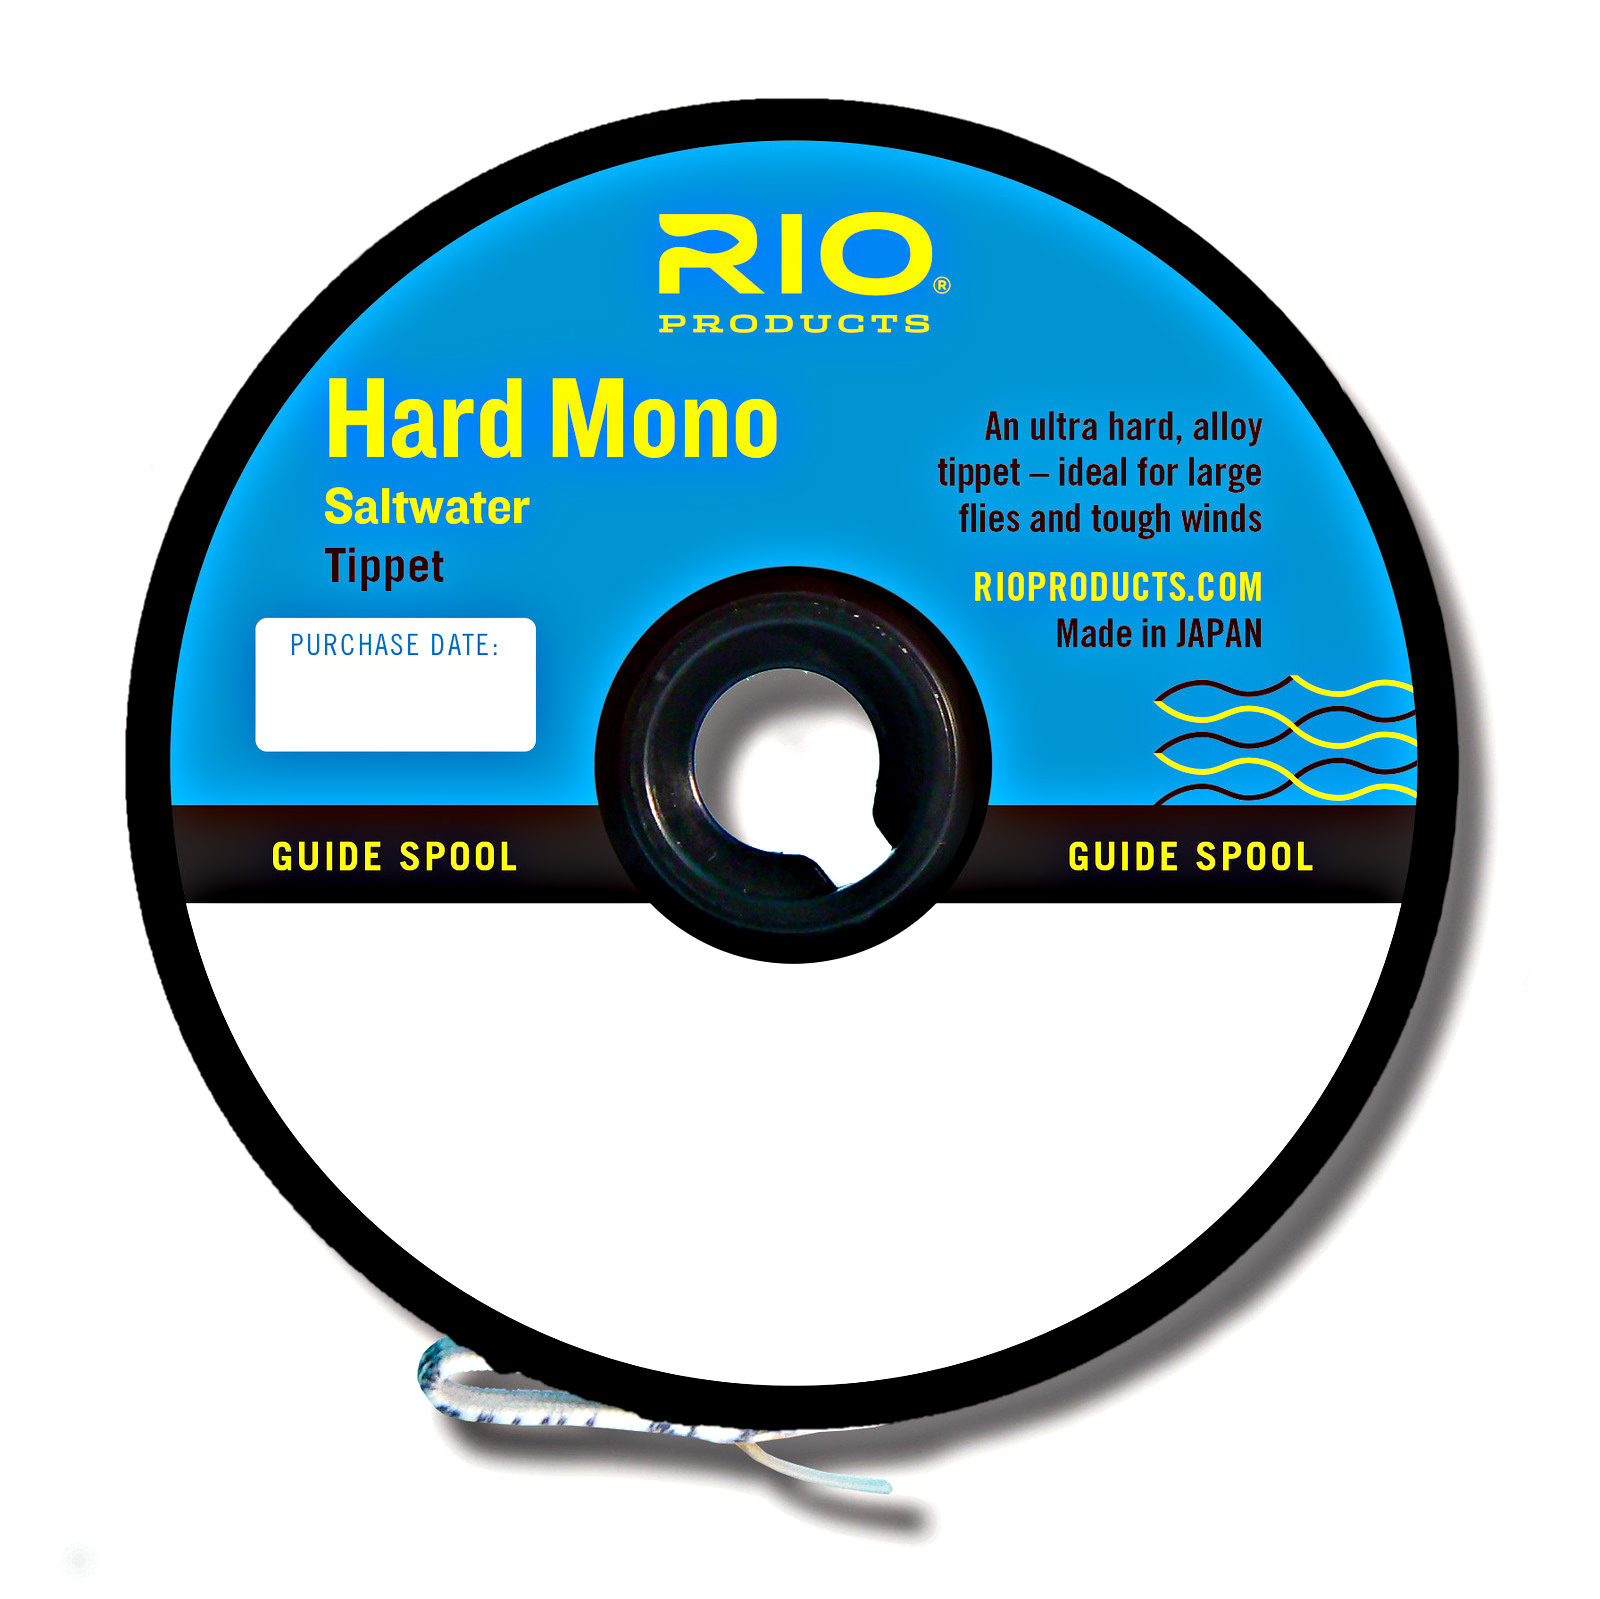 Rio Hard Mono saltwater tippet 30 LB